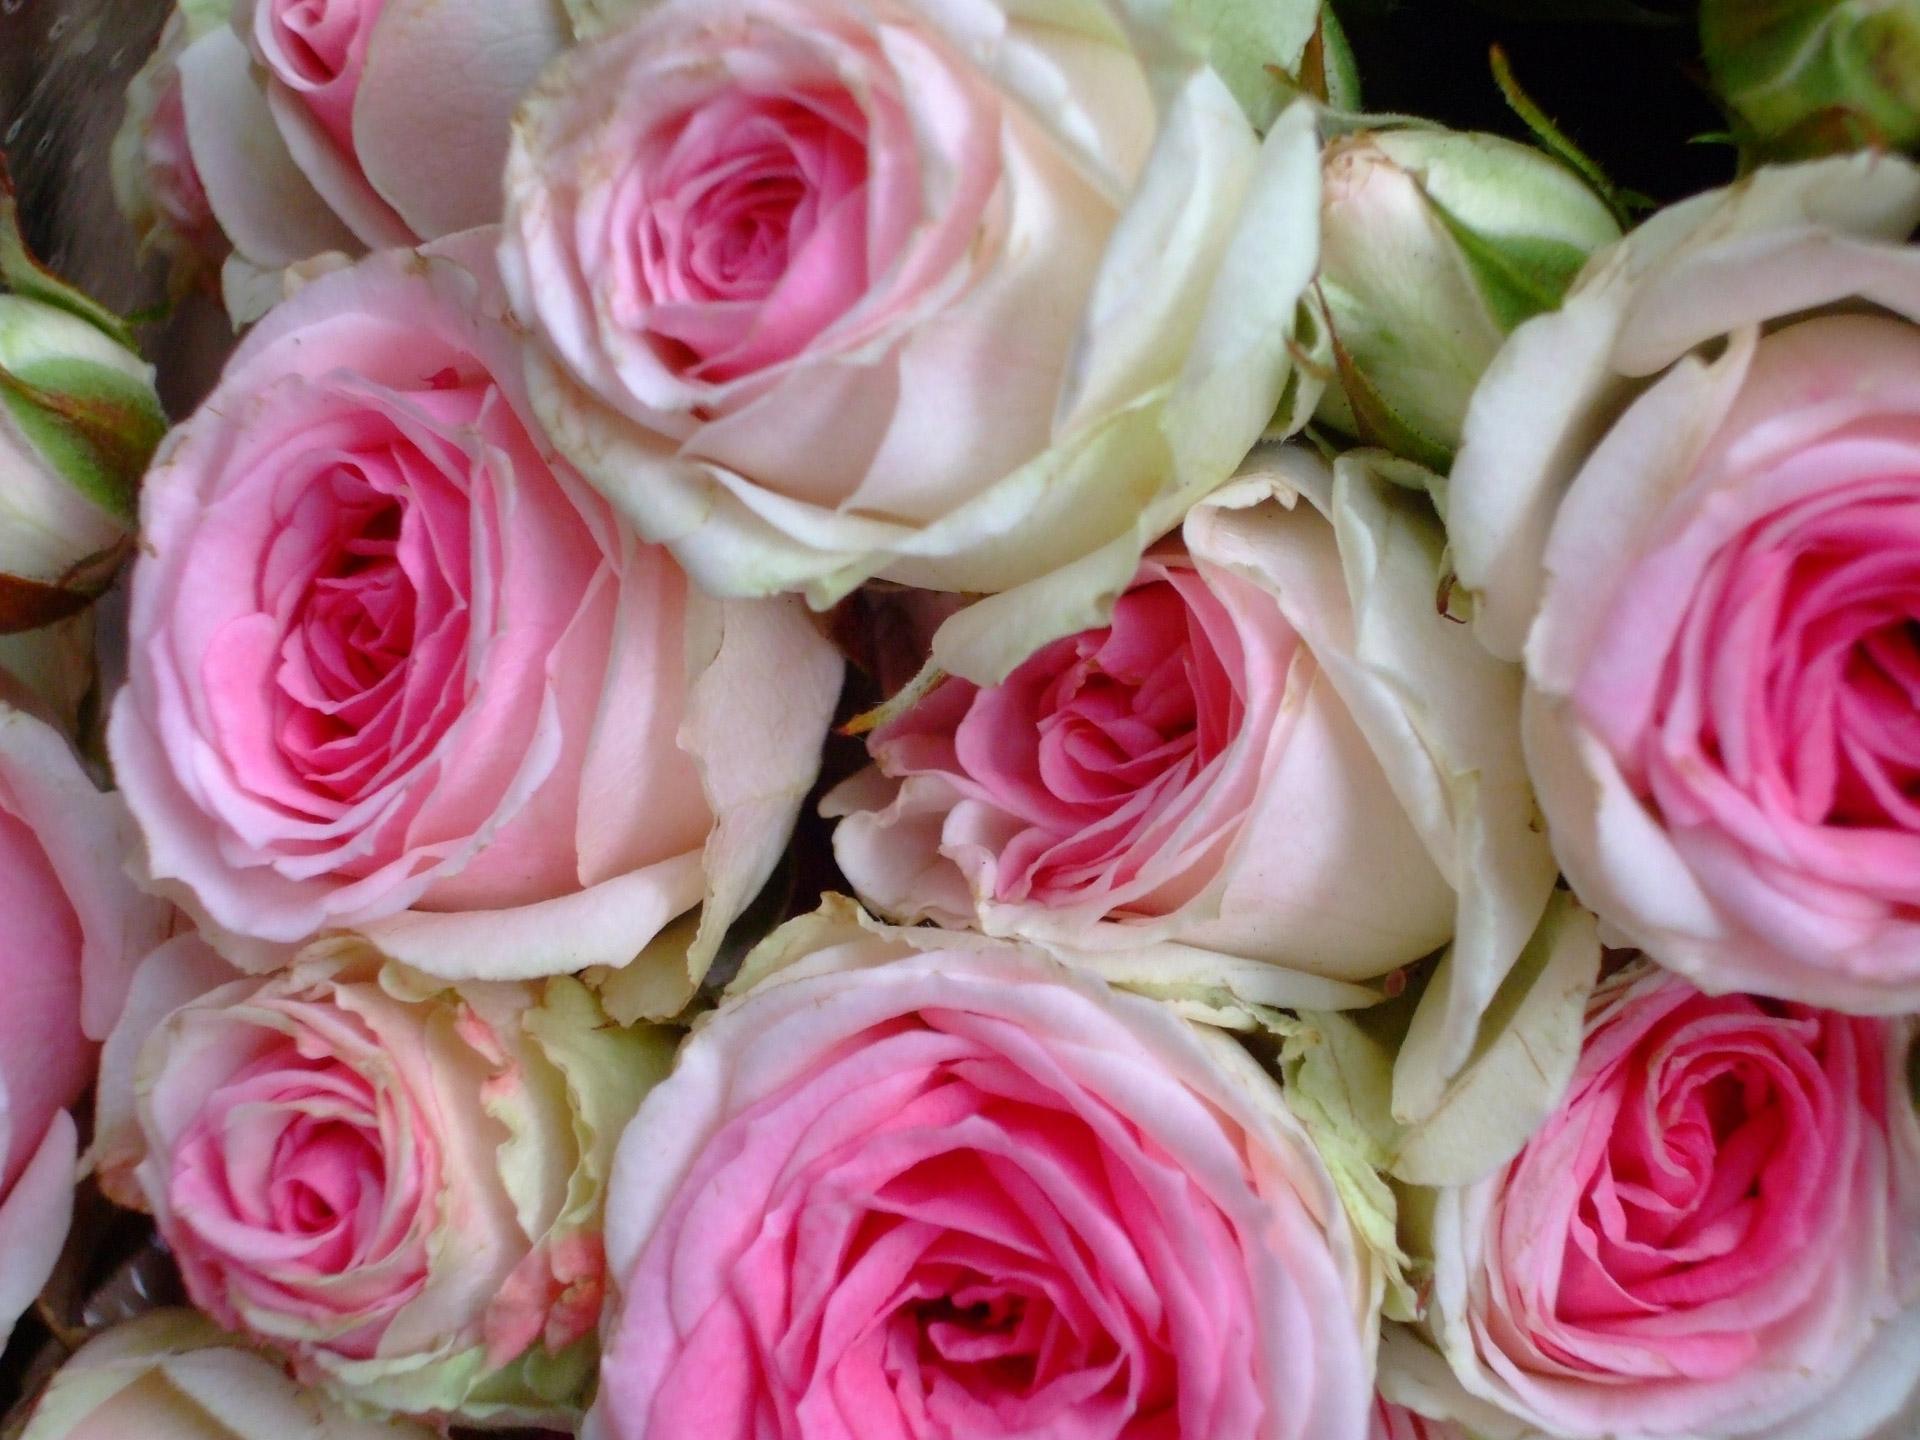 Beautiful Cute Roses Wallpapers Cabbage Rose Wallpaper Hd Pixelstalk Net